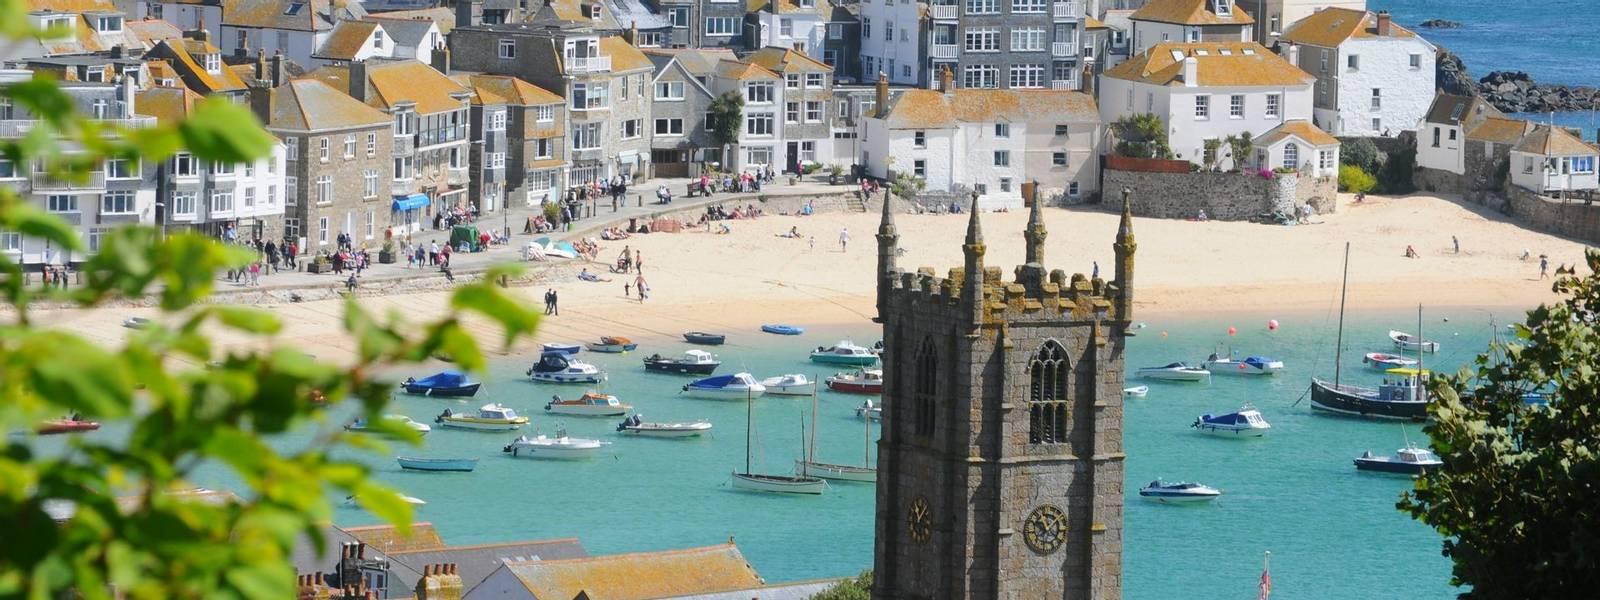 HeritageTours-Cornwall-AdobeStock_33598405.jpeg